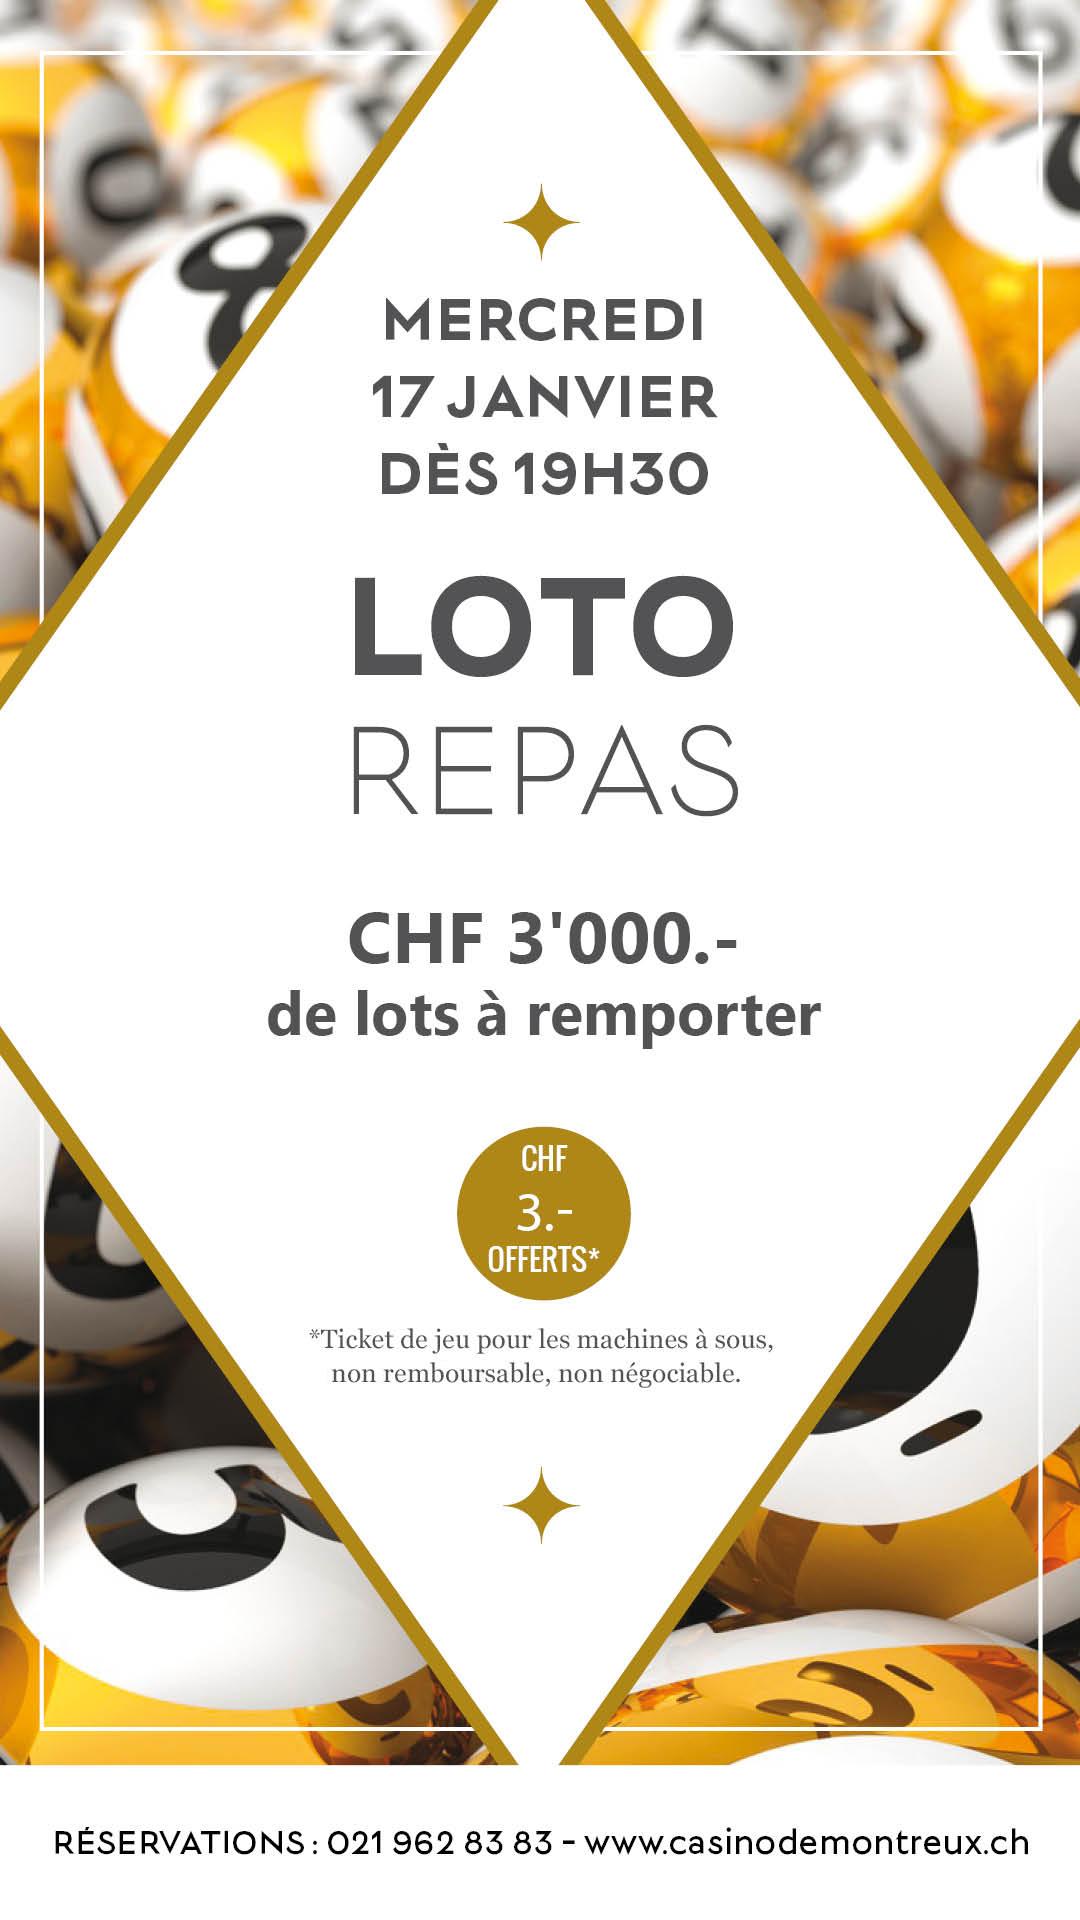 Loto gourmand casino montreux fire poker set amazon